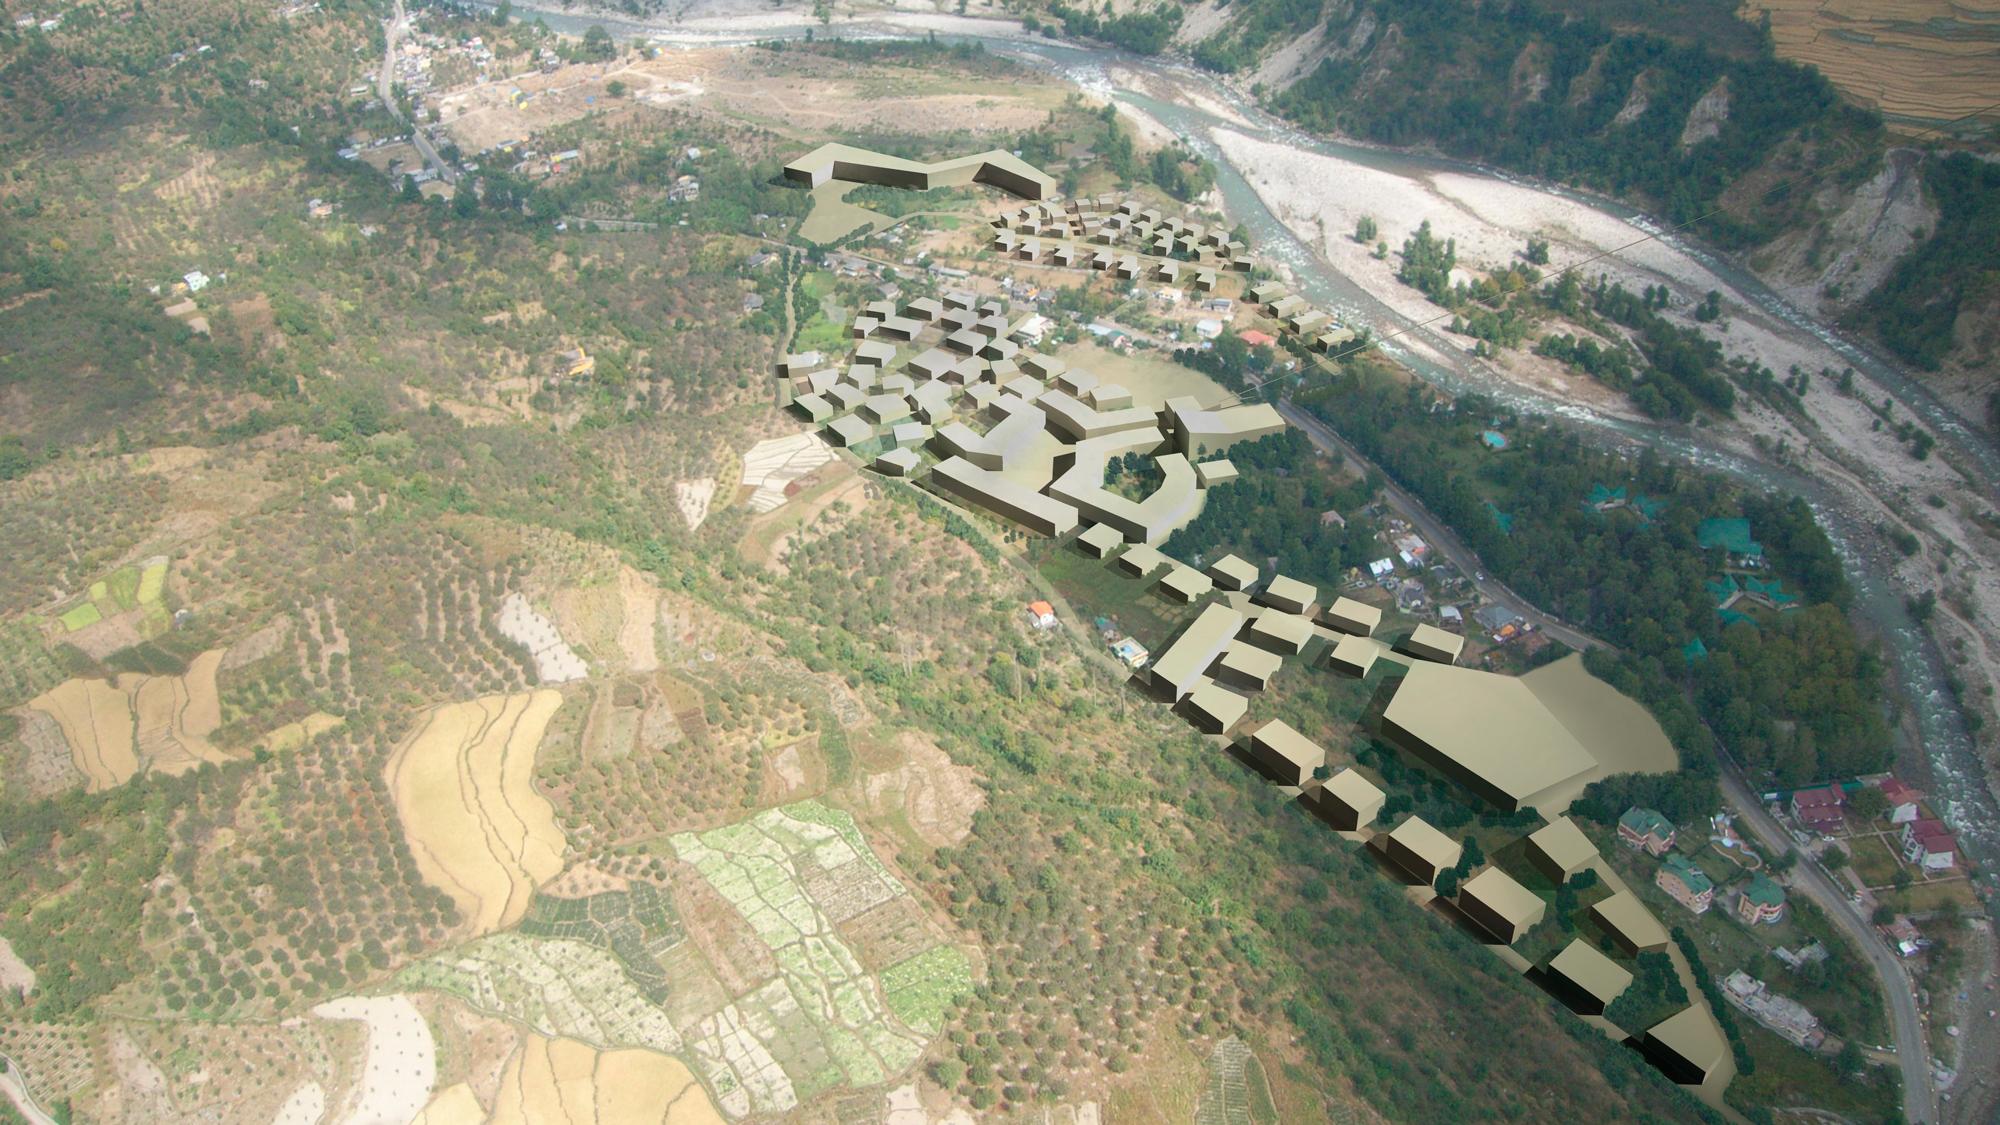 Top of India - Conceptual Masterplan